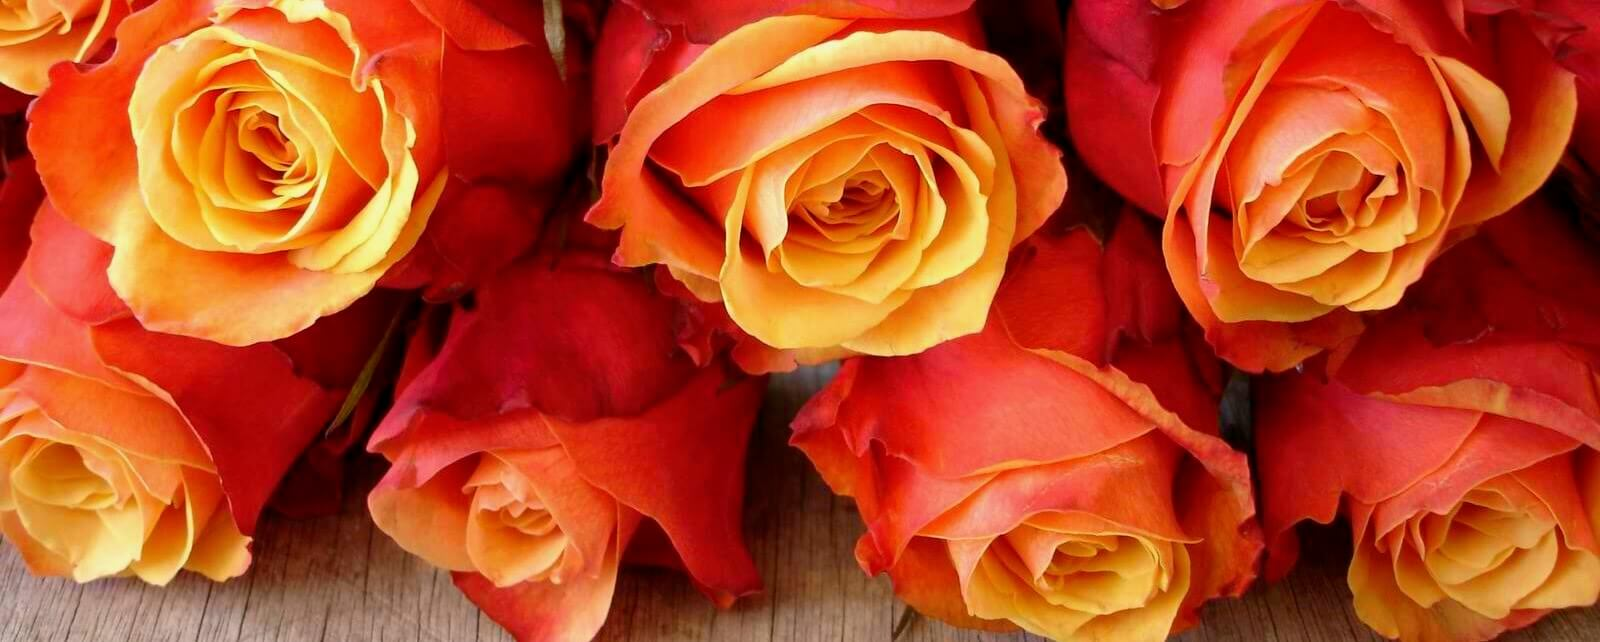 korean-roses-philippines.jpeg